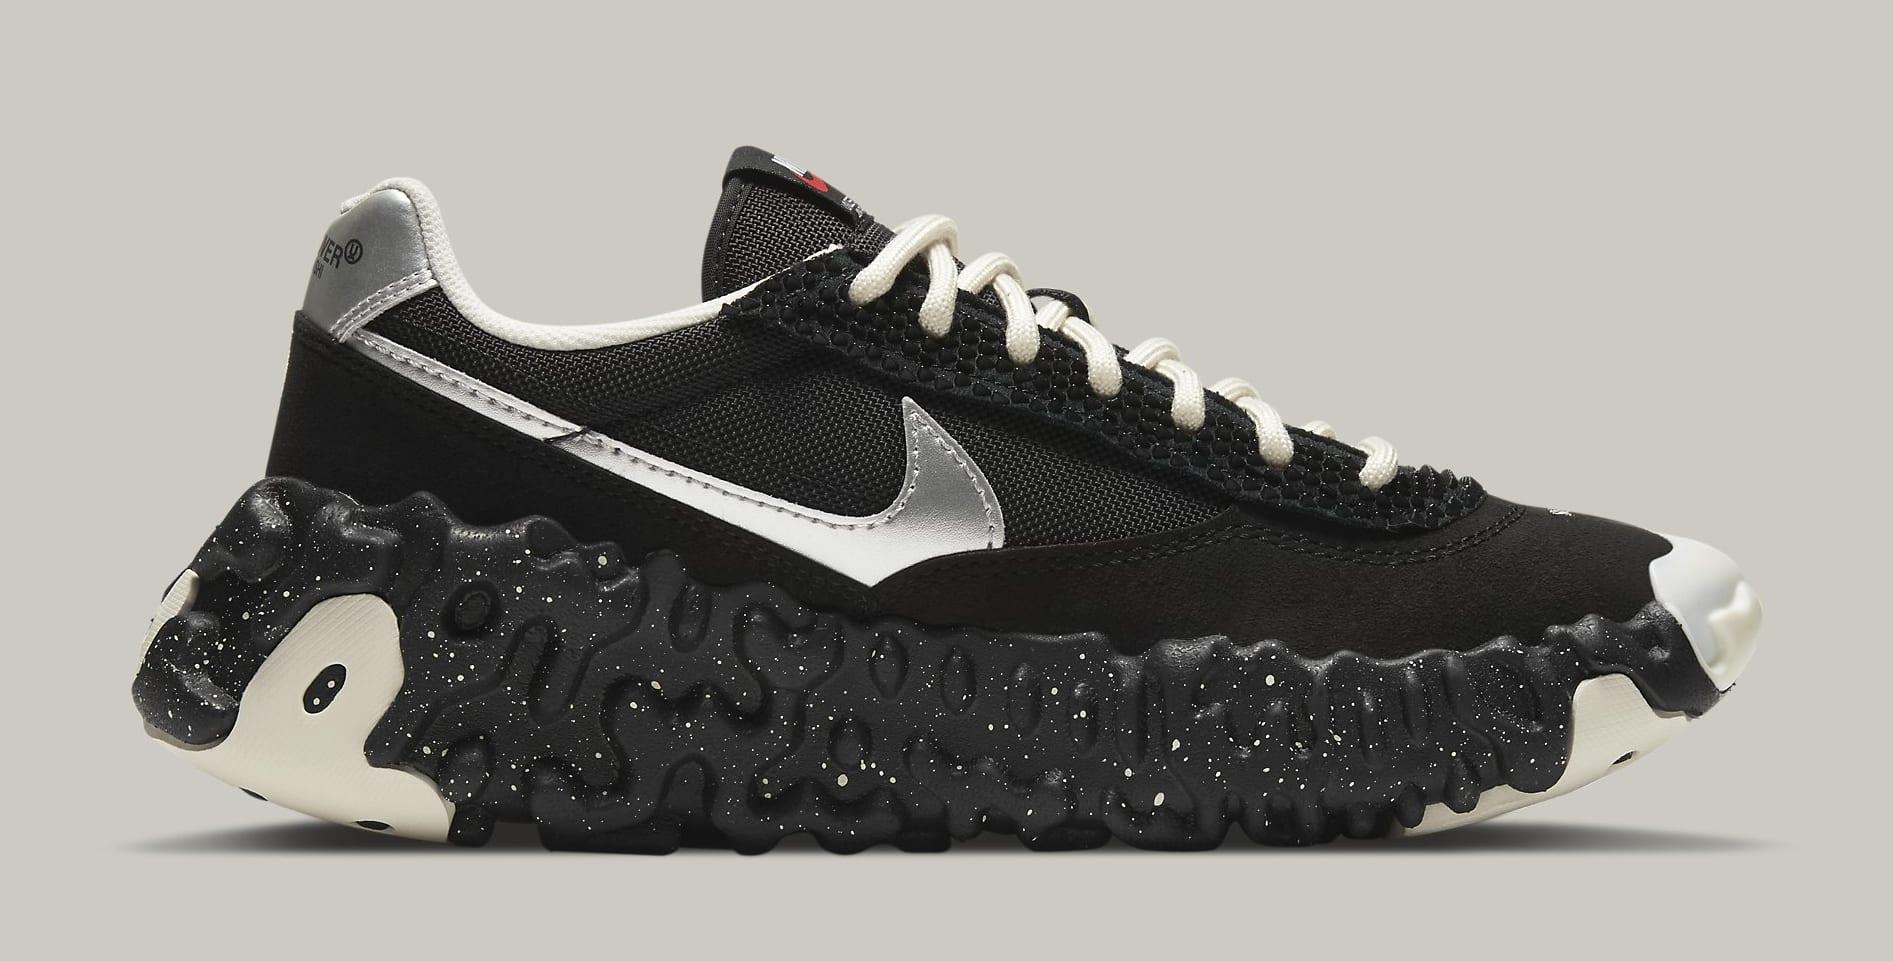 Undercover x Nike Overbreak SP 'Black' DD1789-001 Medial